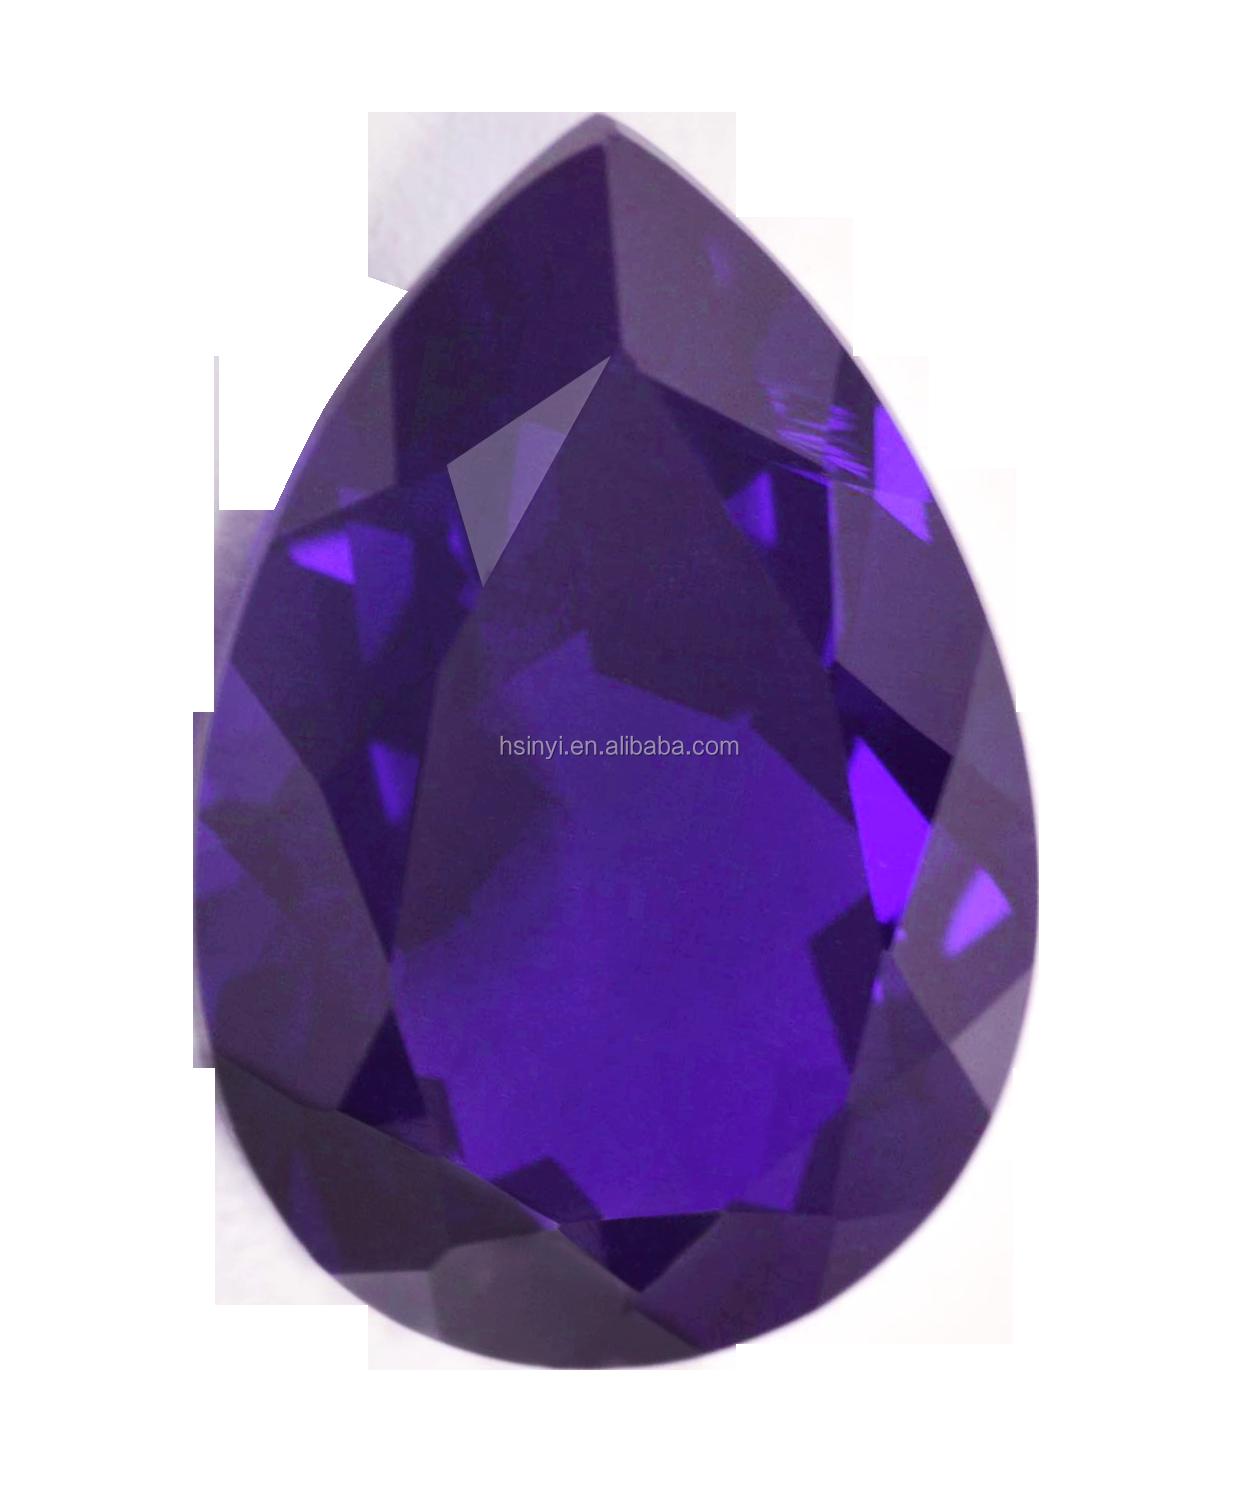 CZ Pear Champagne 6x8mm 7x9mm 8x10mm 8x12mm Loose AAA Cubic Zirconia Gemstone